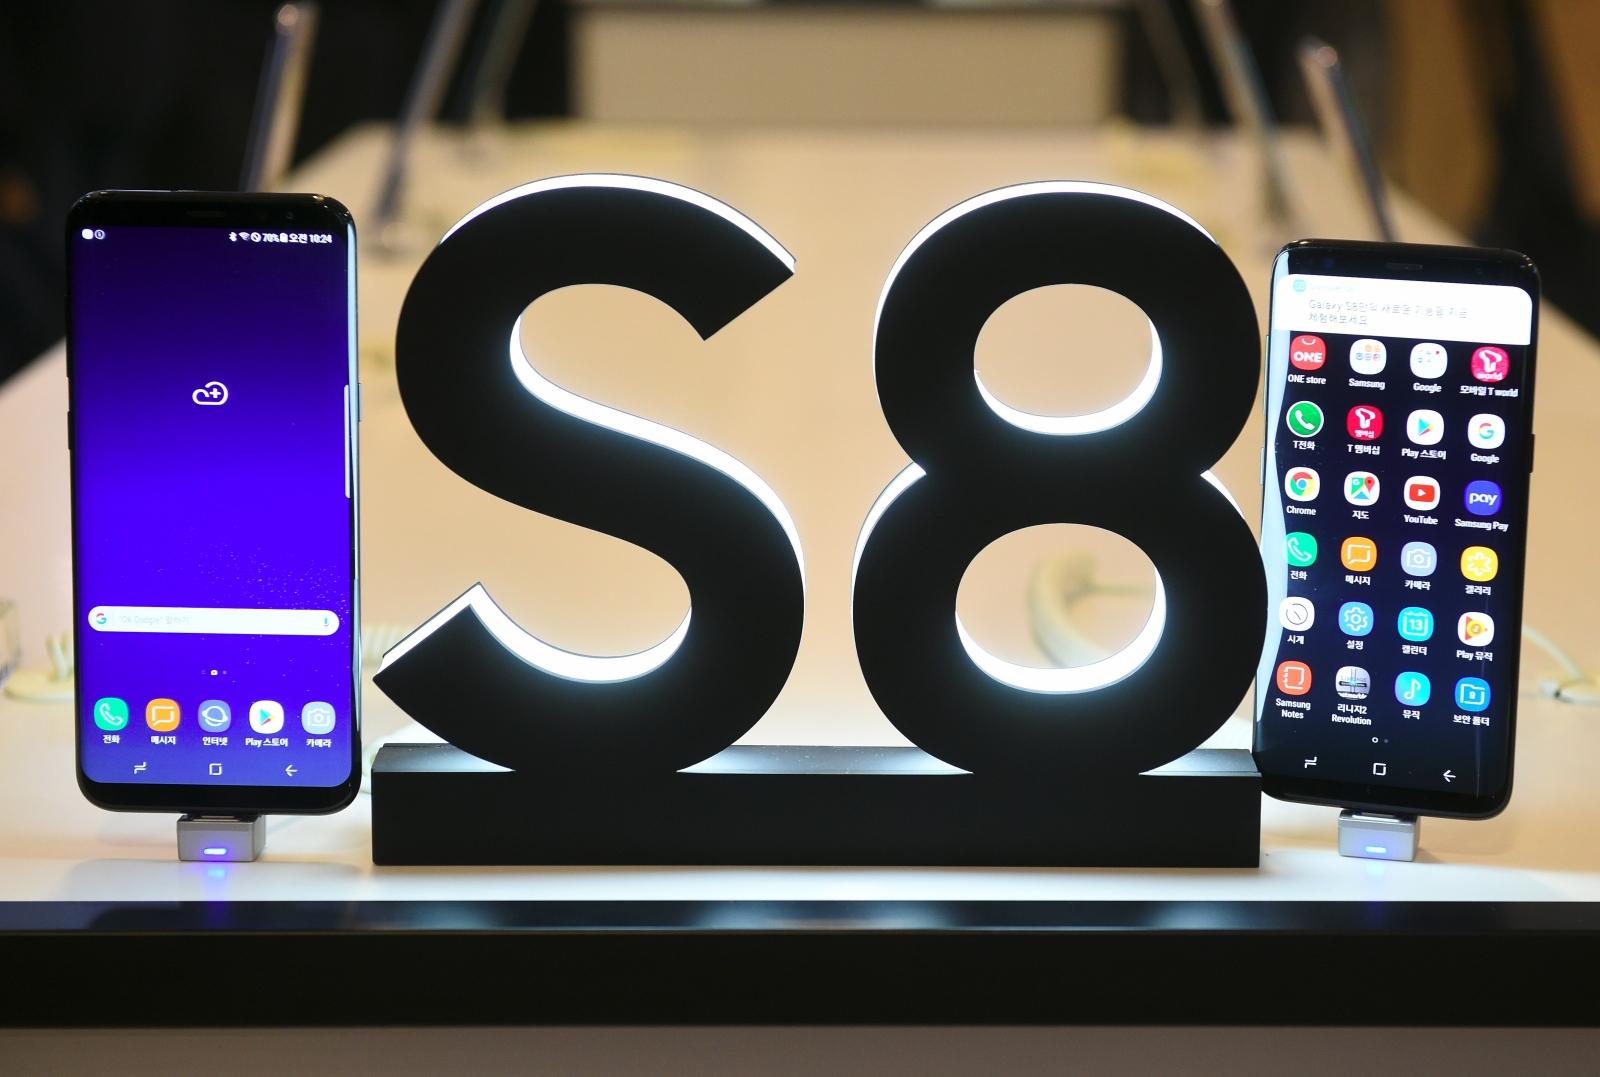 Galaxy S8 and S8+ teardown